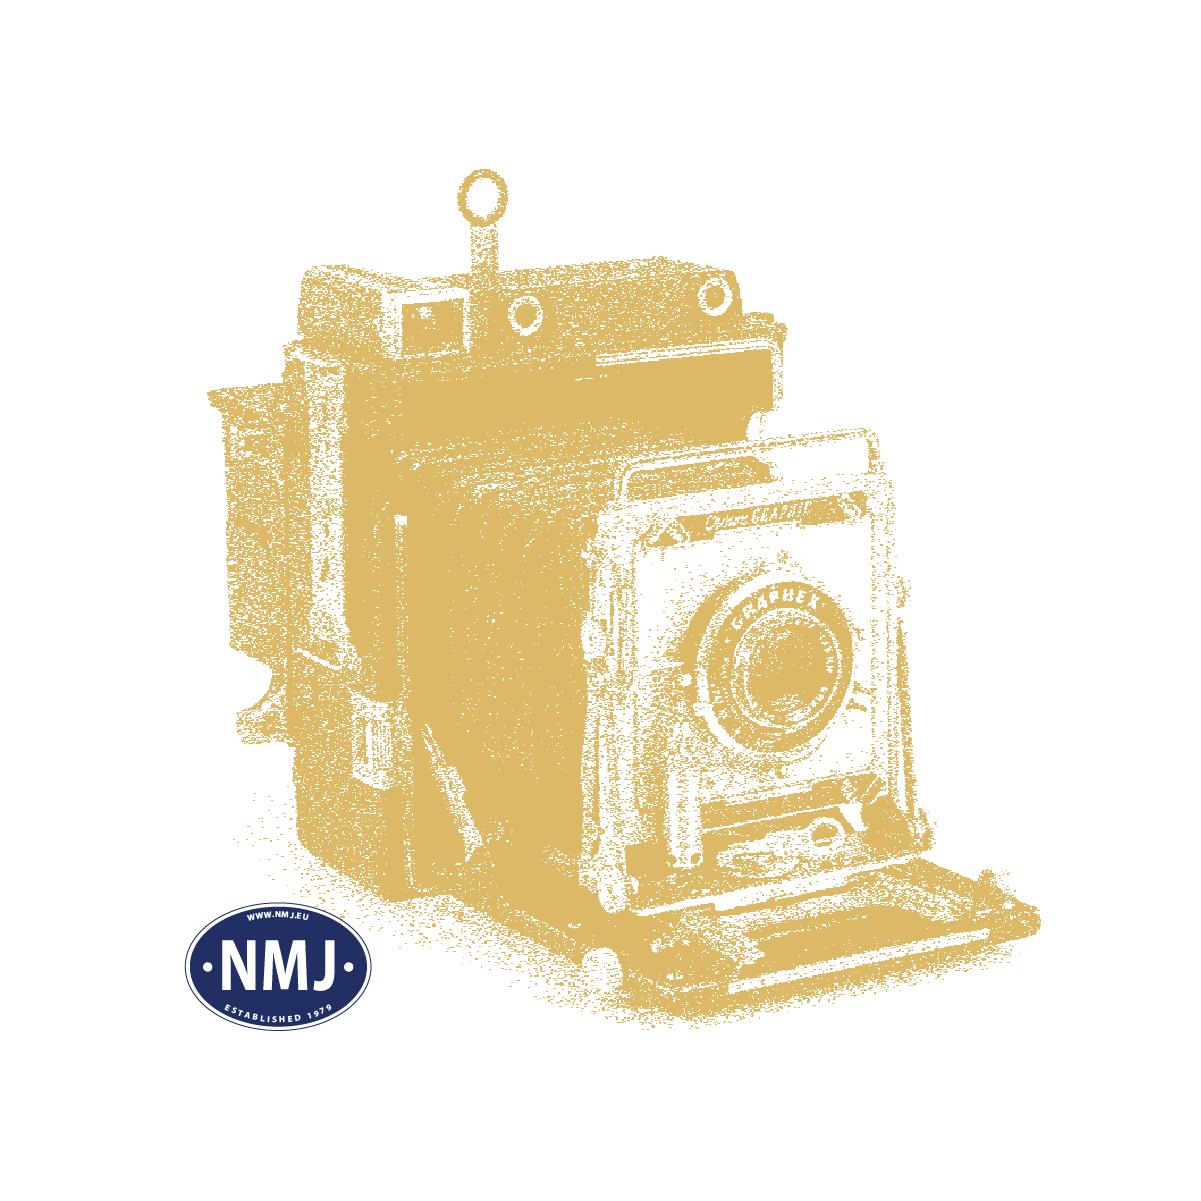 NMJT83.212 - NMJ Topline NSB Skd 224.216, Rot/Gelb, DCC Digital, H0